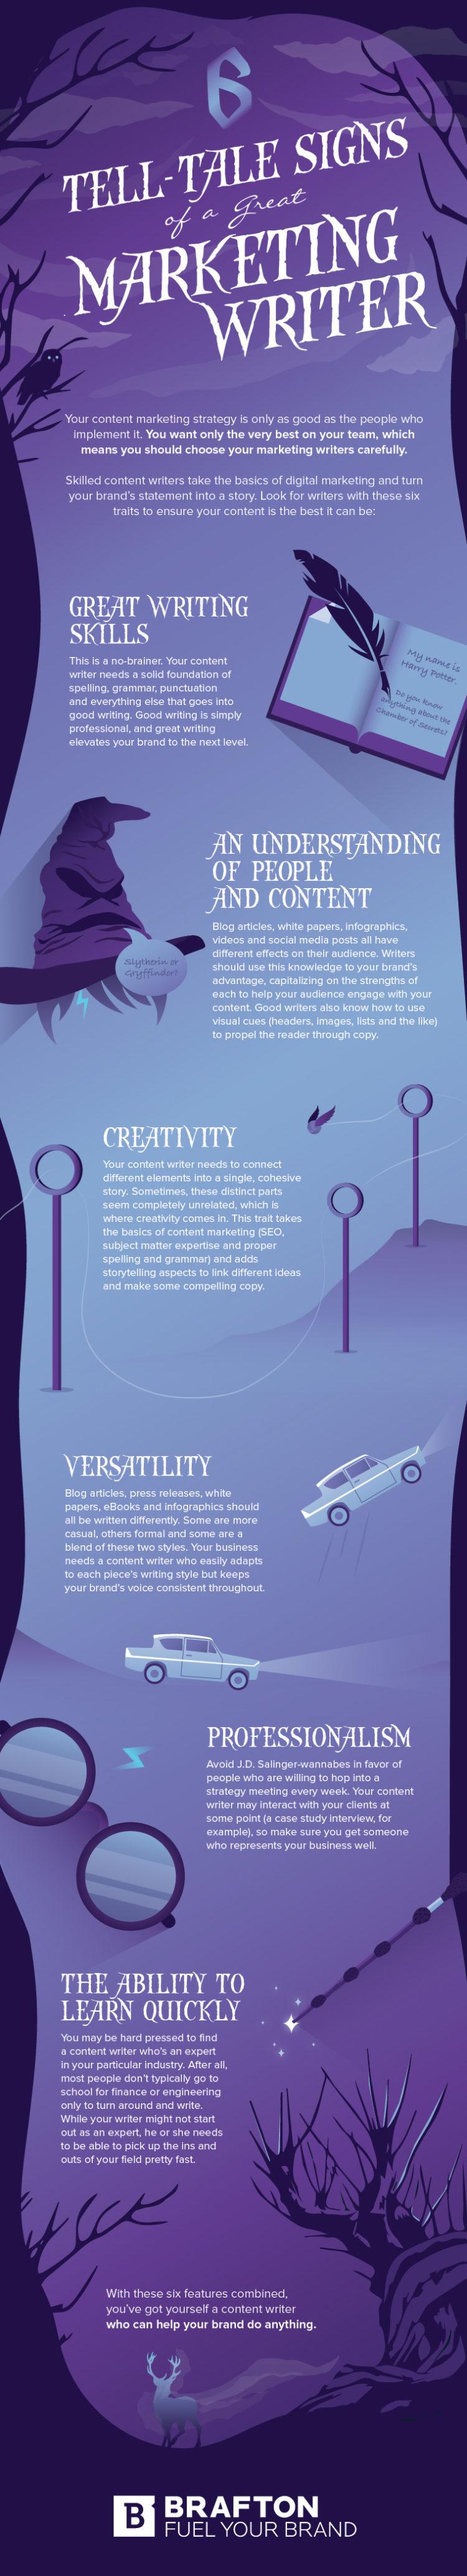 Graphic Design Services Brafton